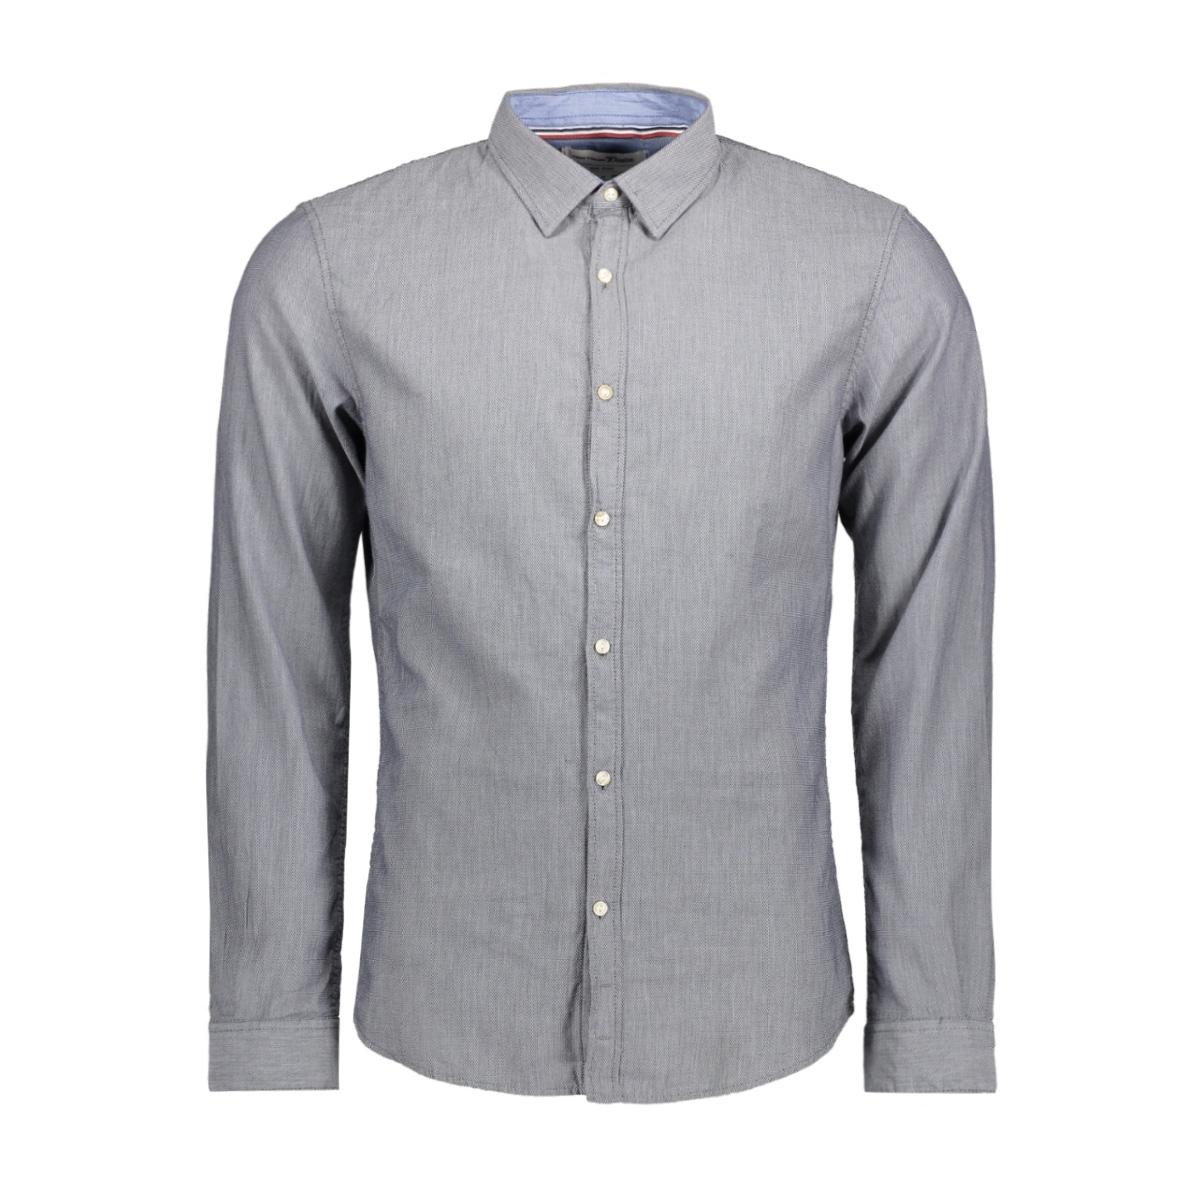 2033573.09.12 tom tailor overhemd 6576